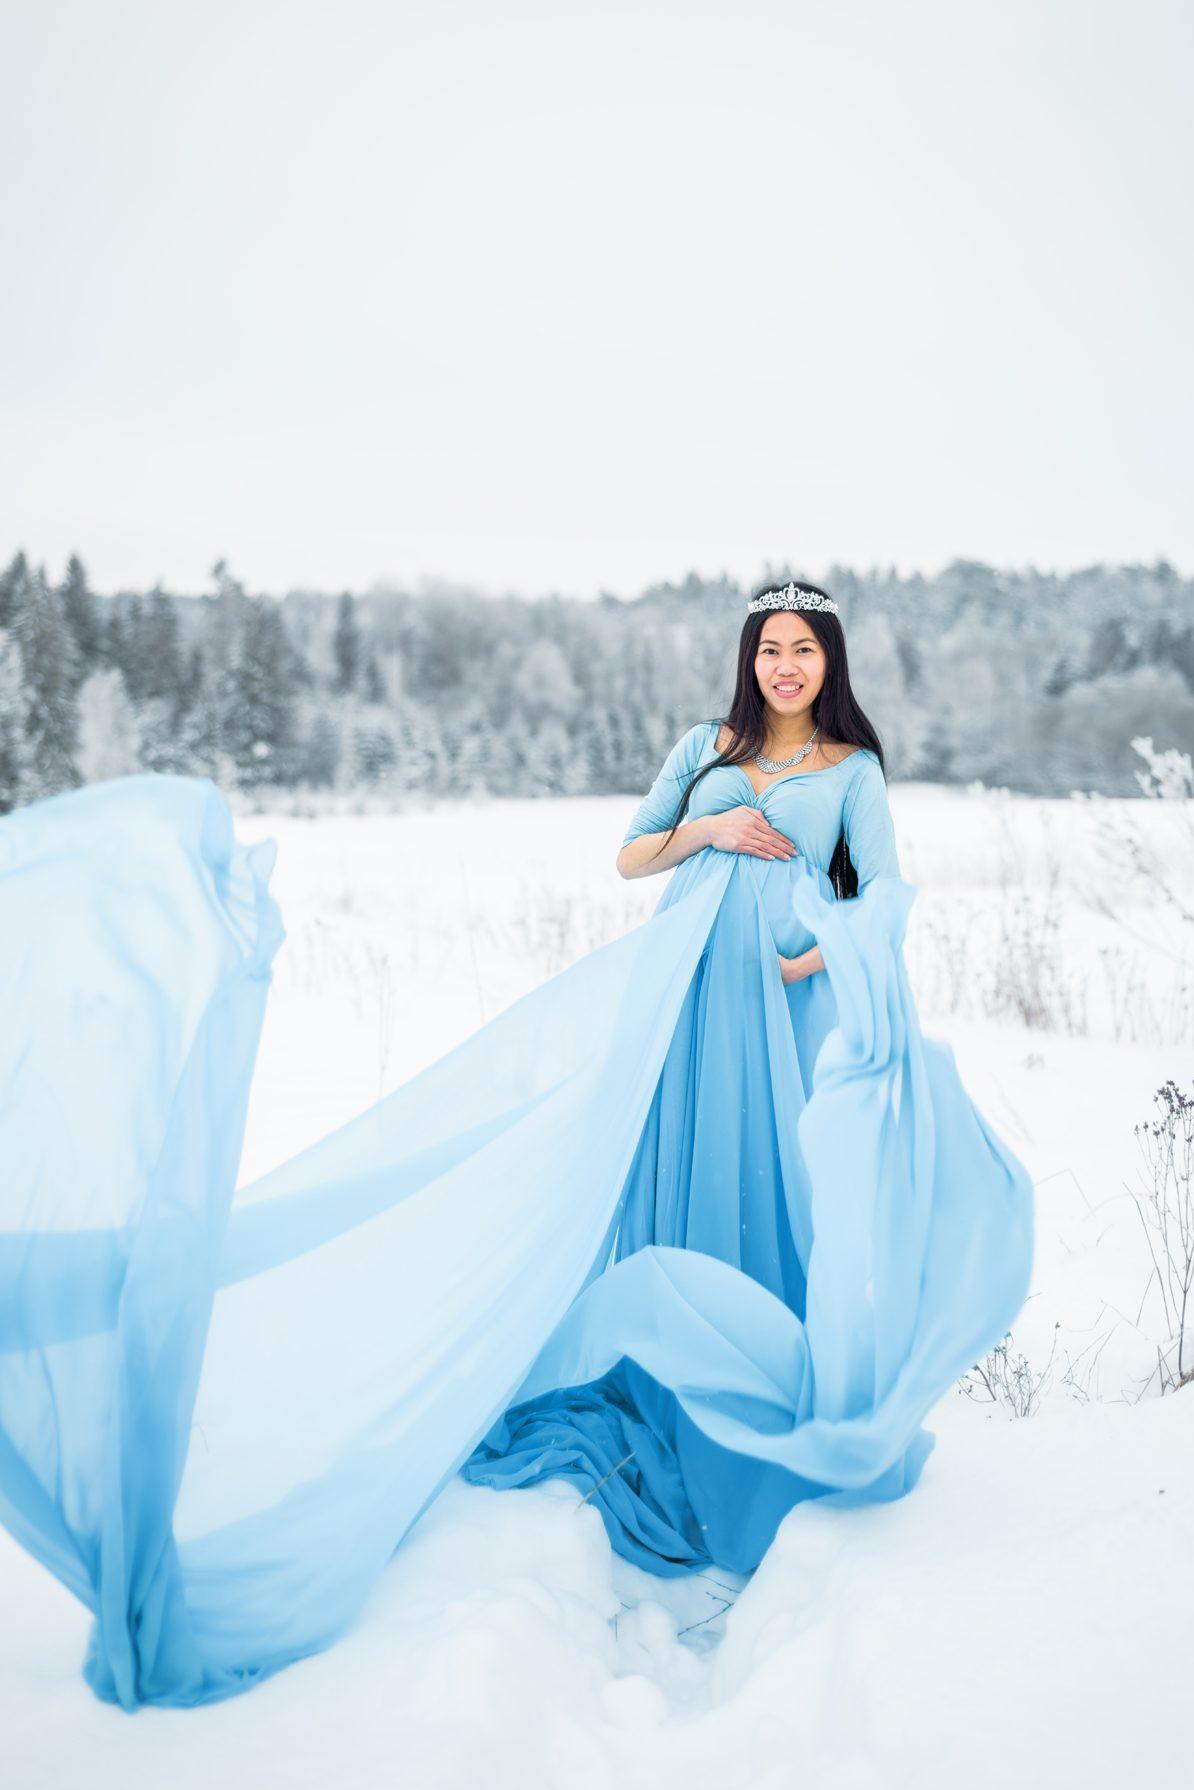 Winter Wonderland Maternity